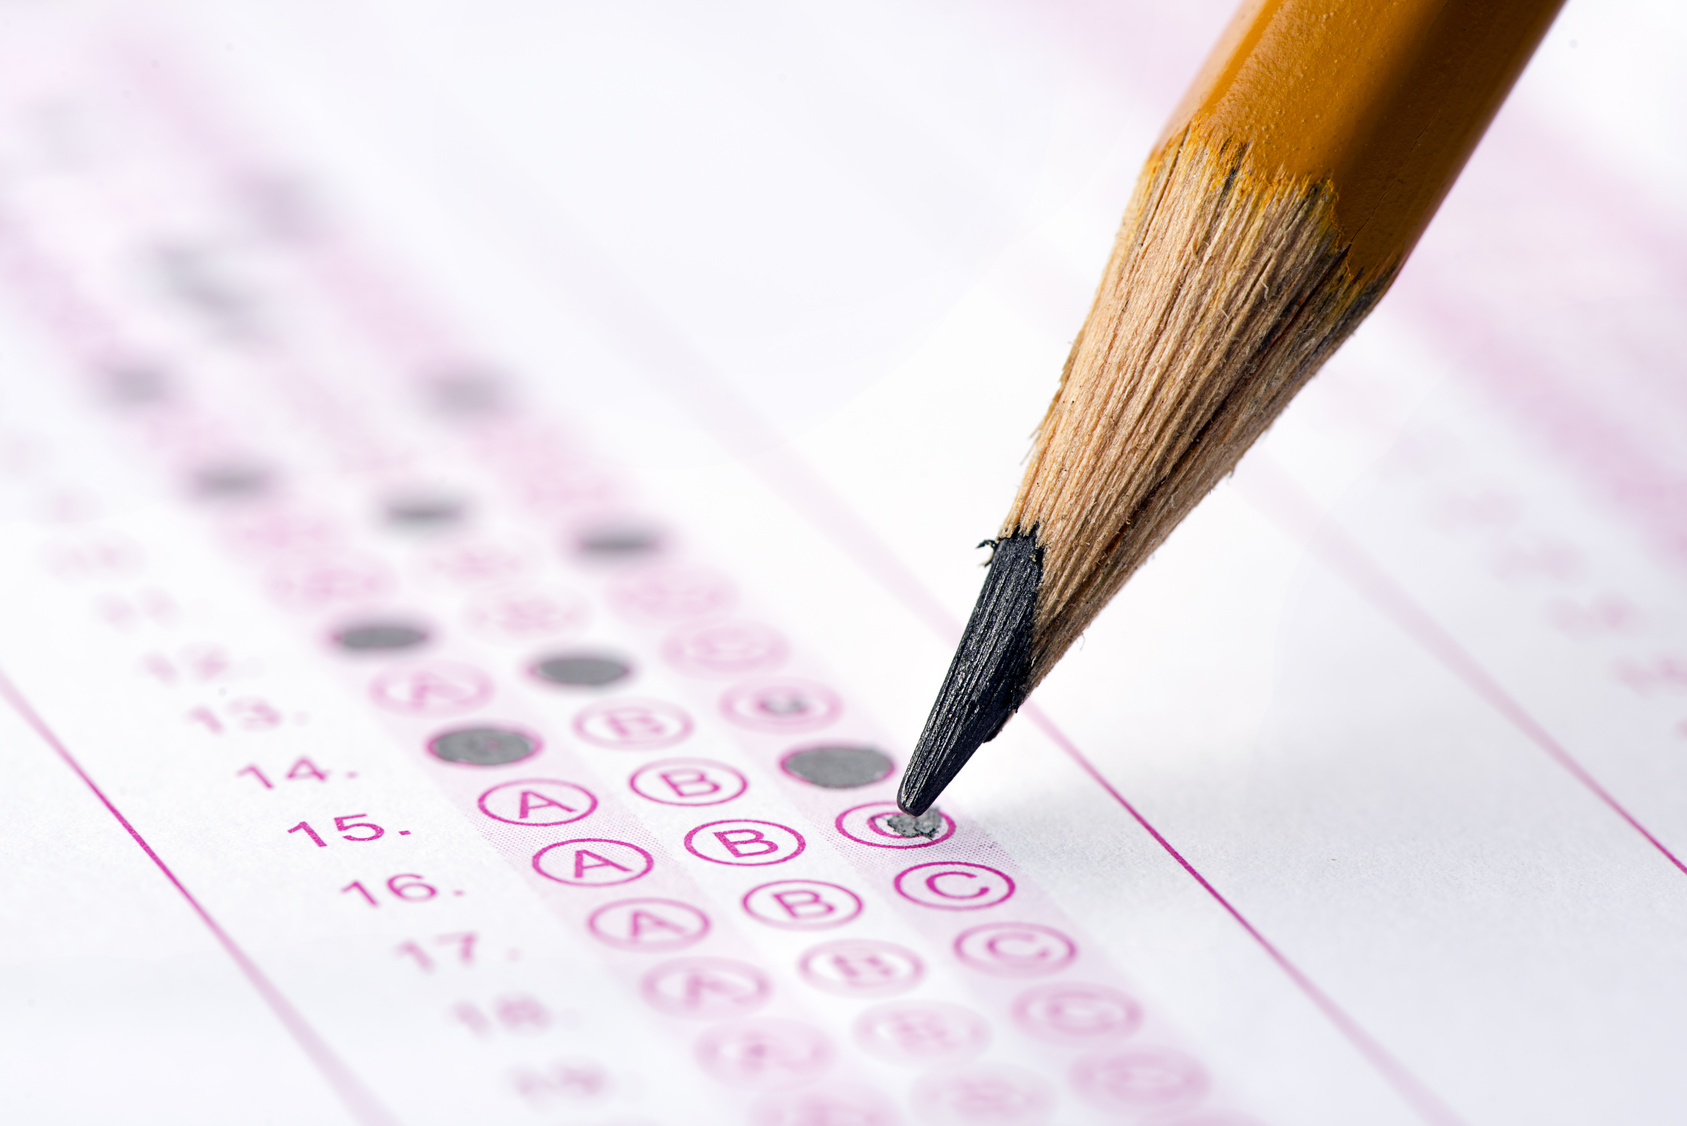 Test Testing Exam